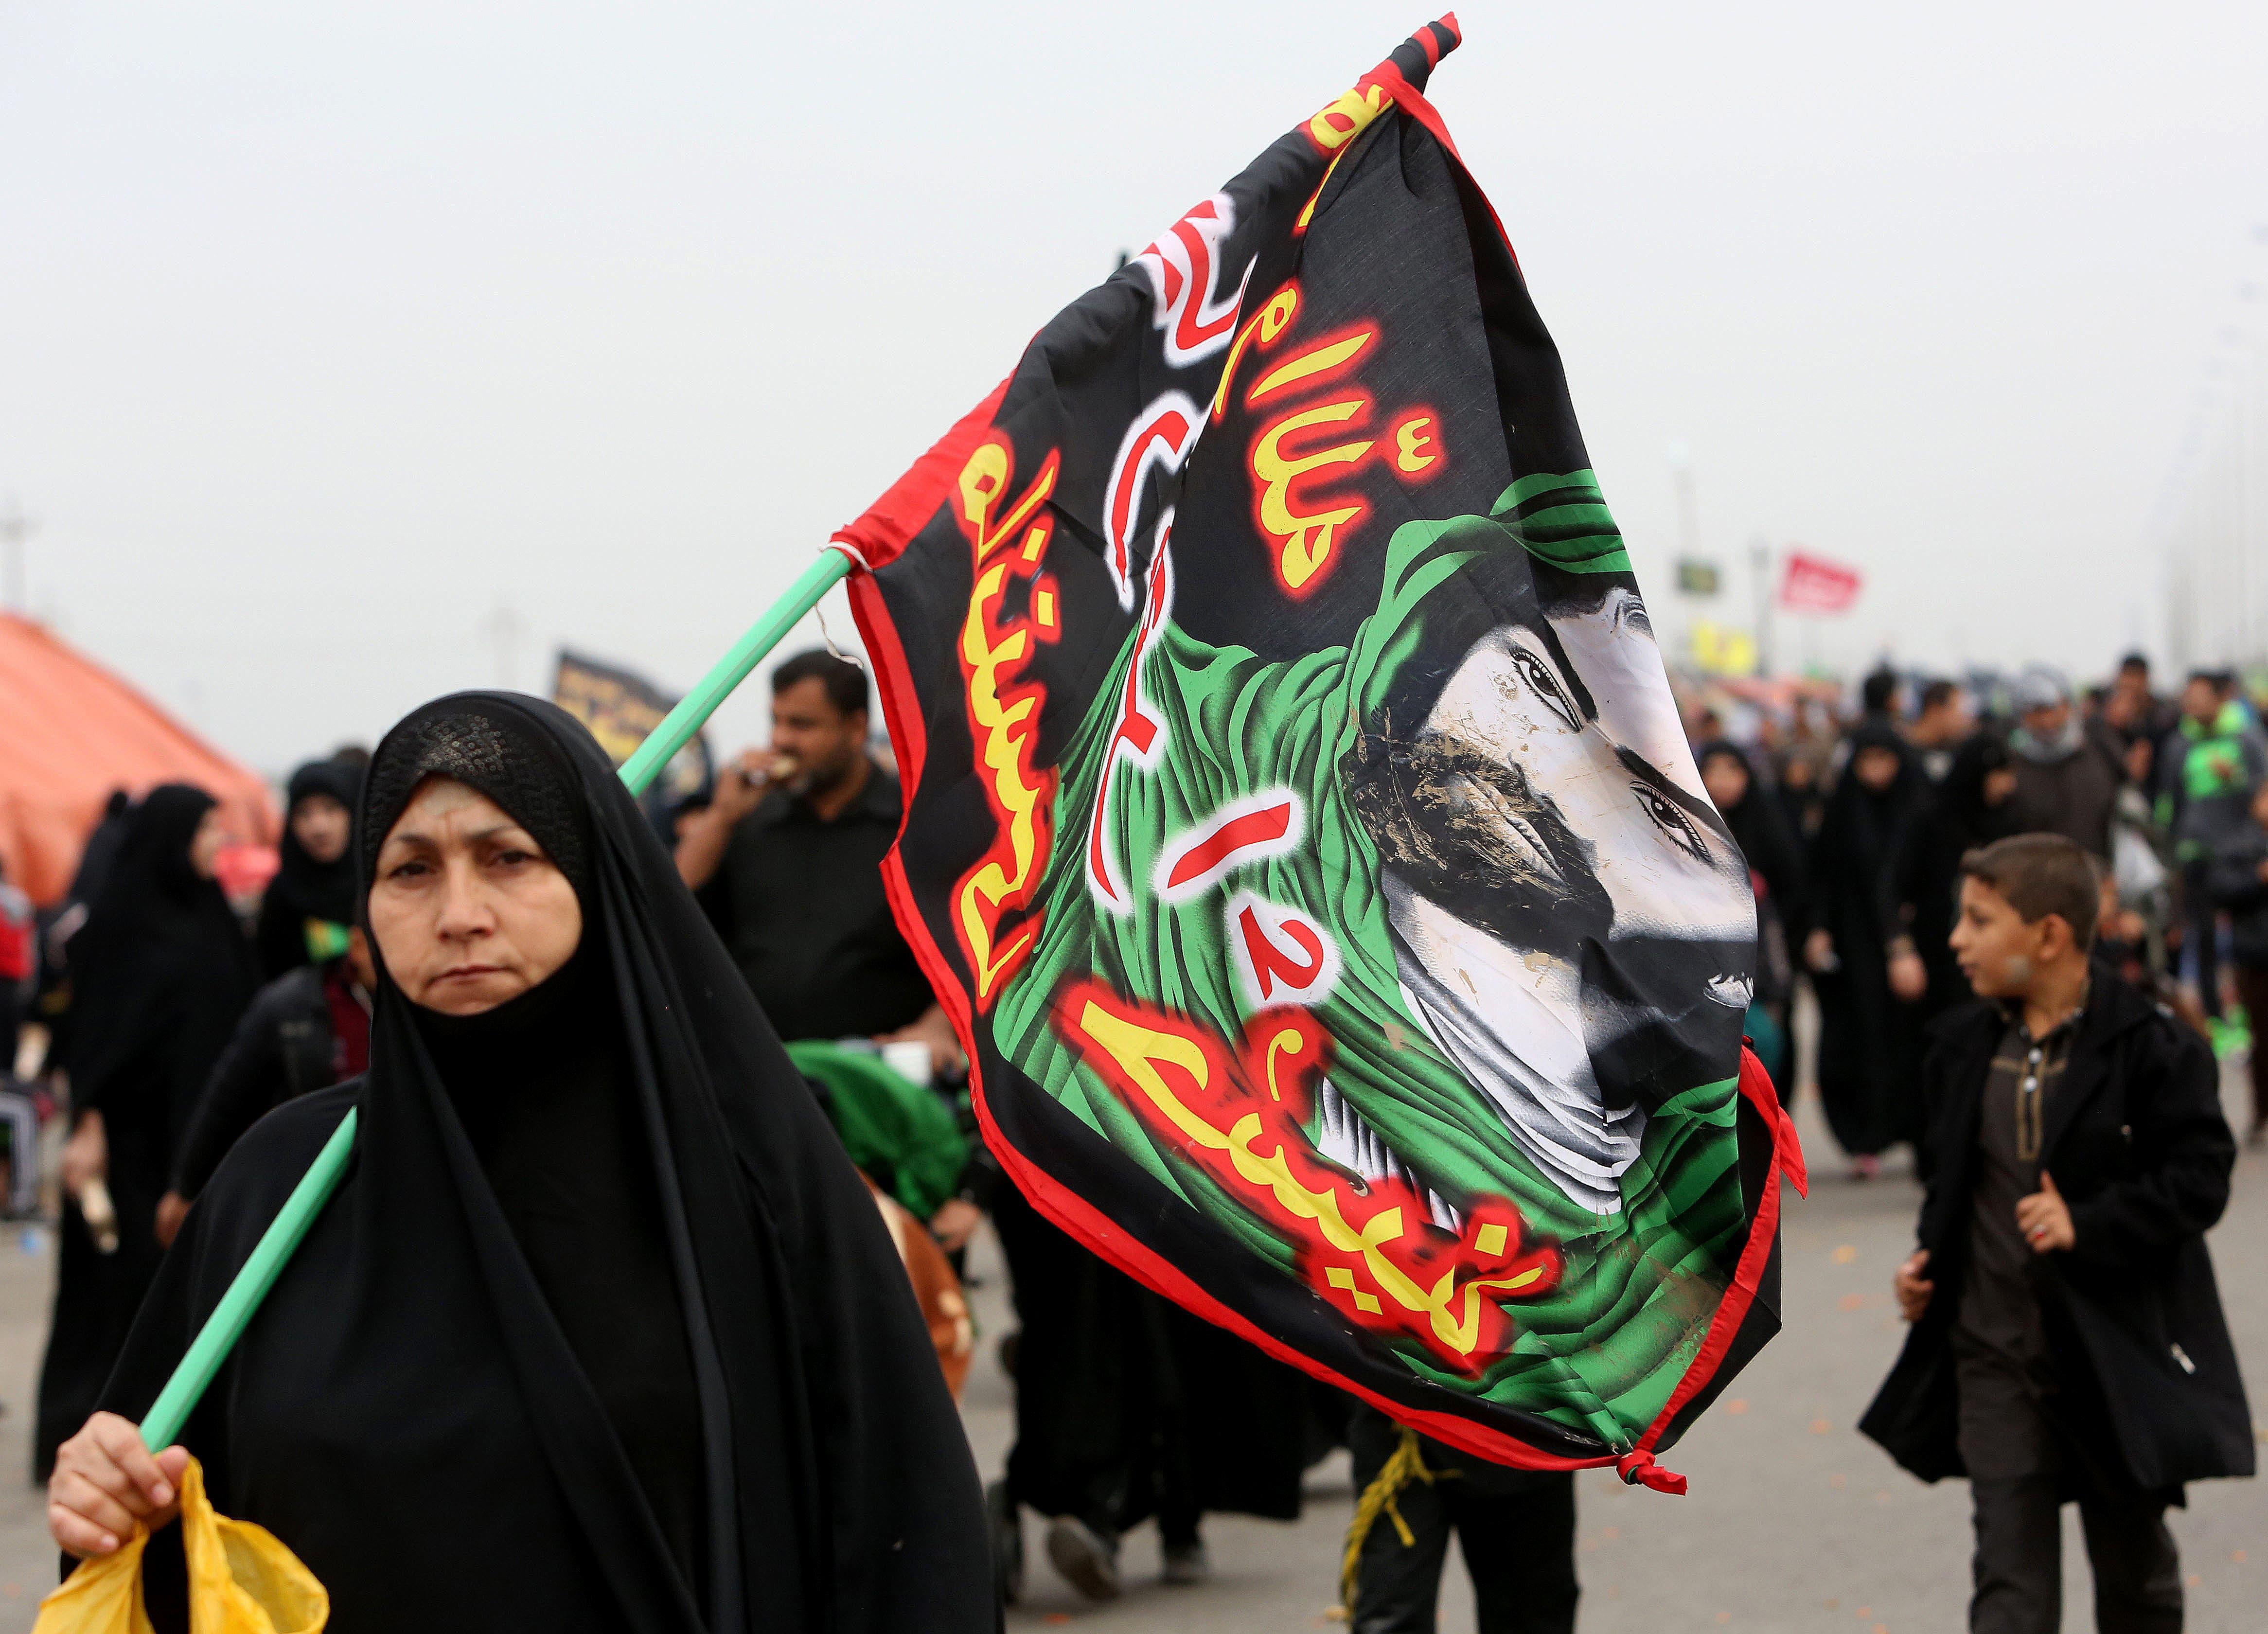 Shiite pilgrims make their way to Karbala for Arbaeen, in Basra, 340 miles (550 kilometers) southeast of Baghdad, Iraq, Thursday, Dec. 3, 2015.